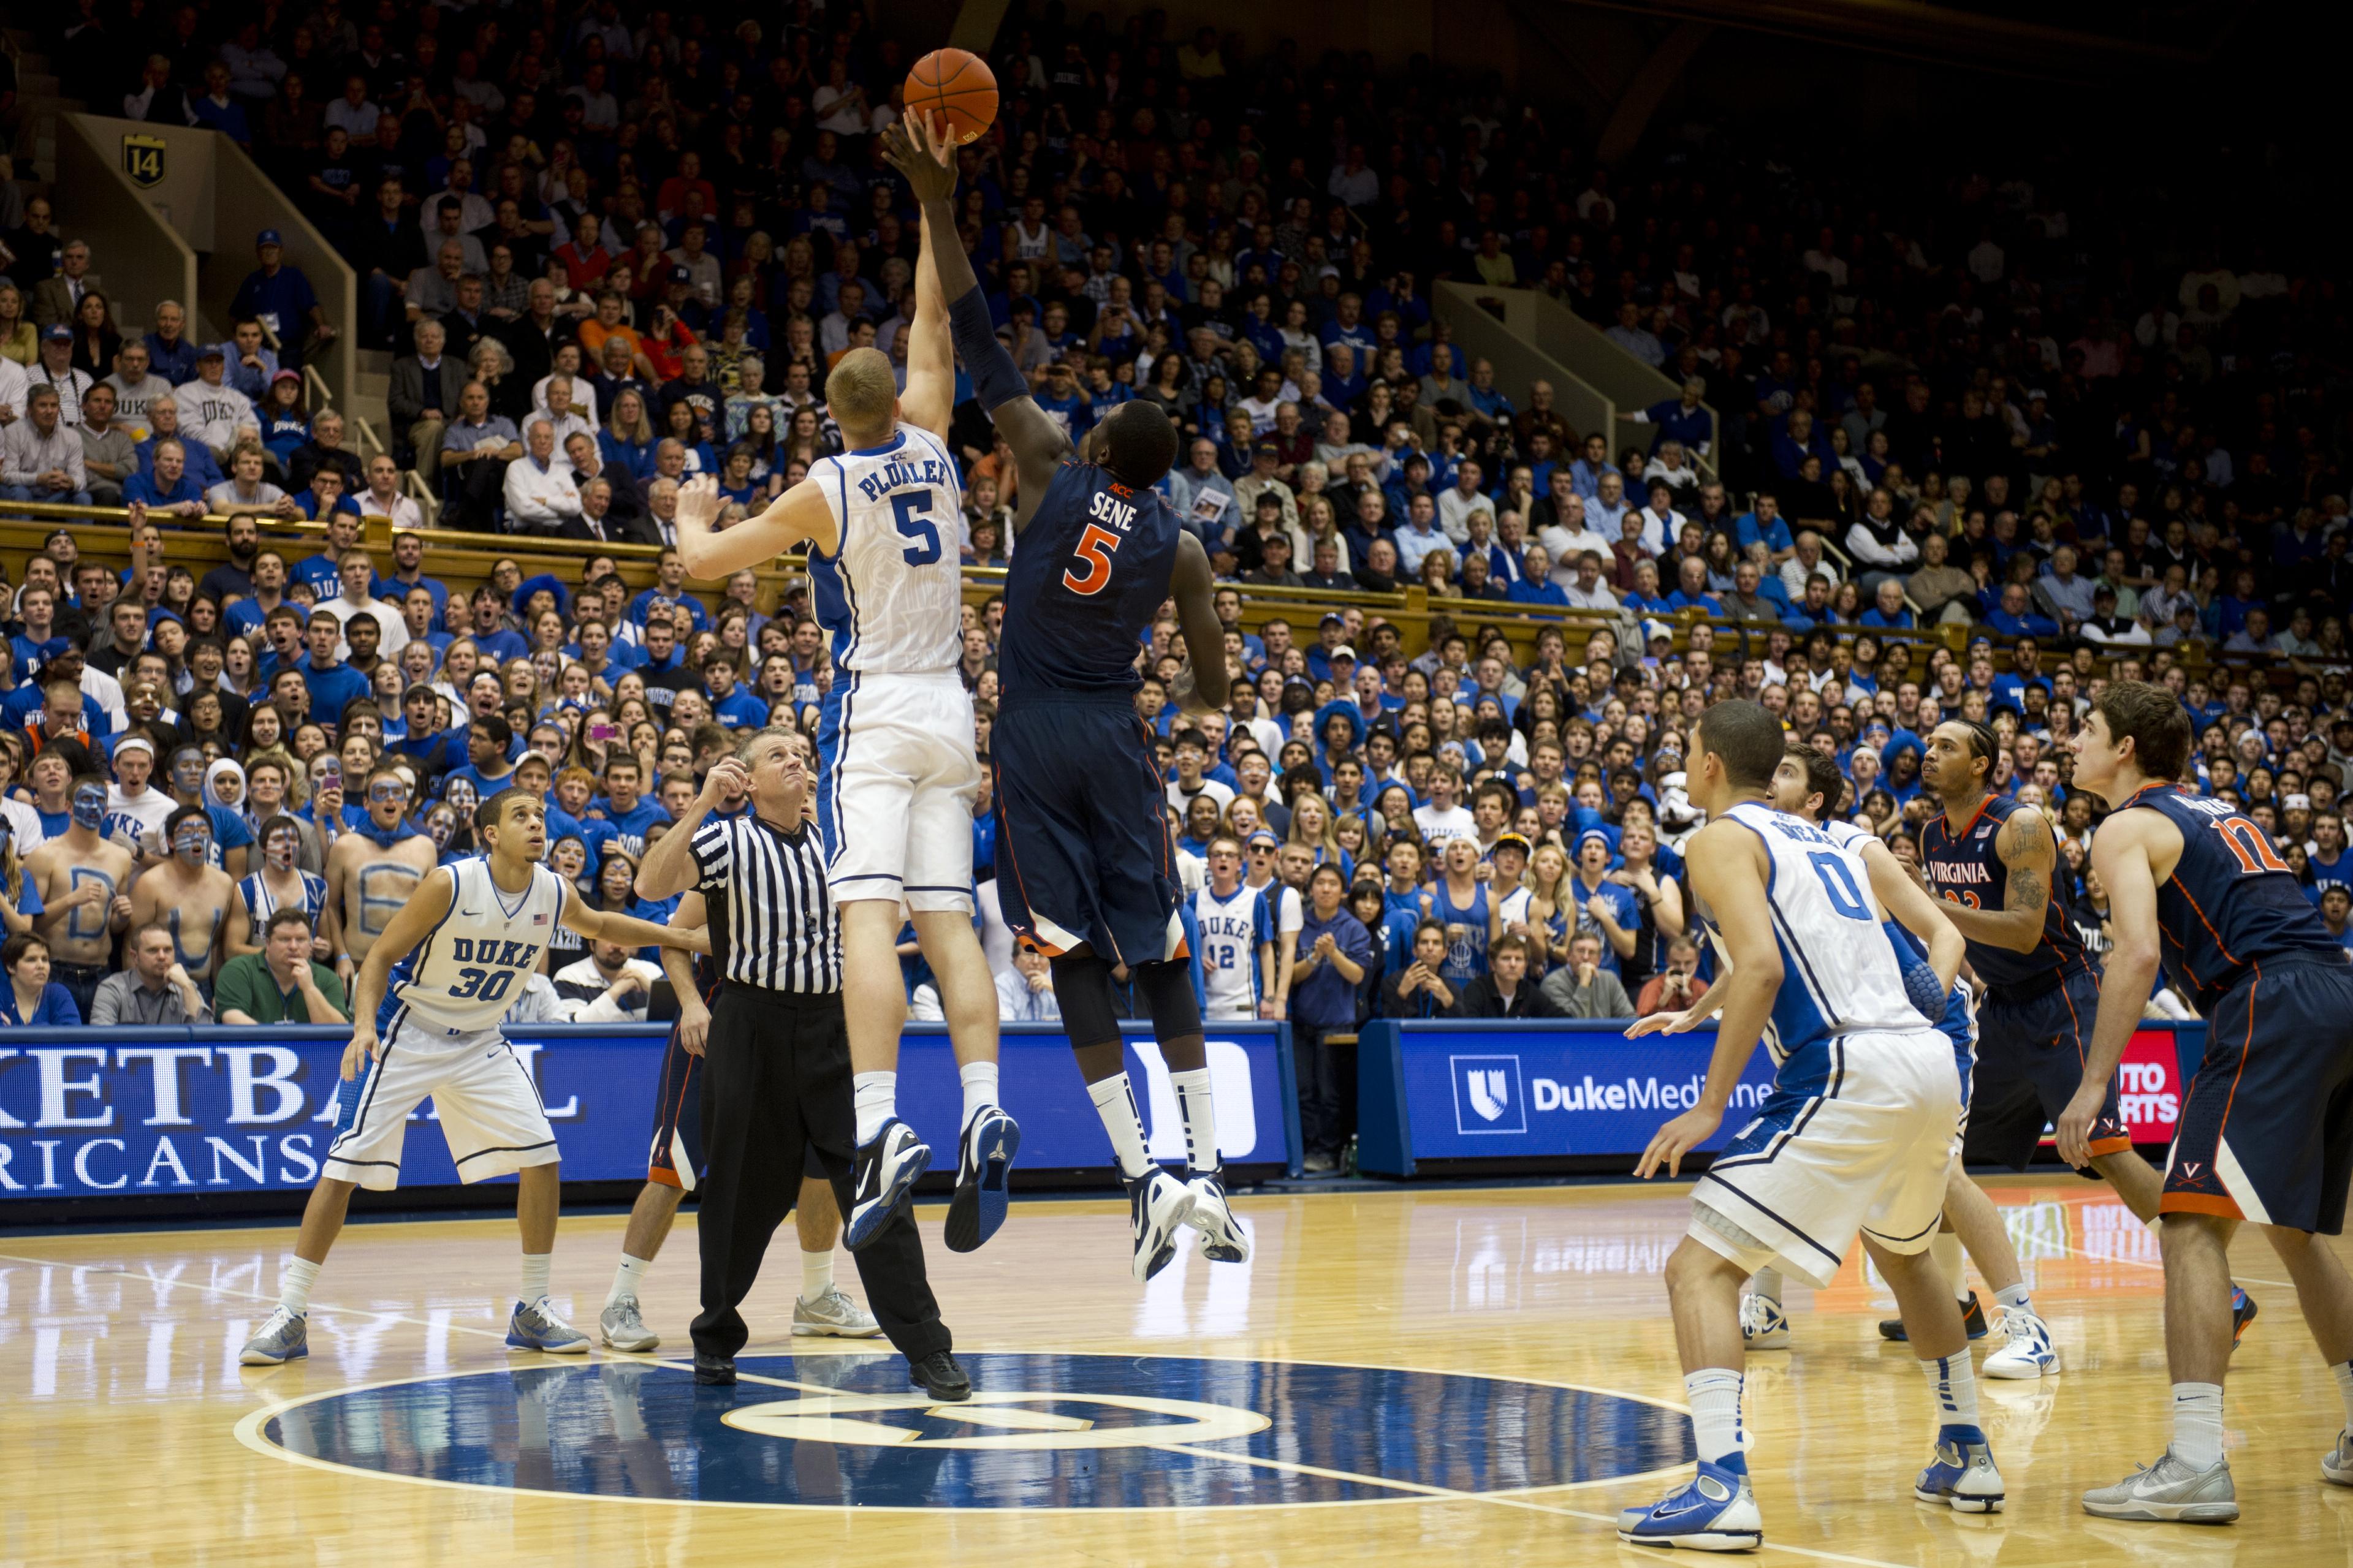 Tip-off between Duke and University of Virginia